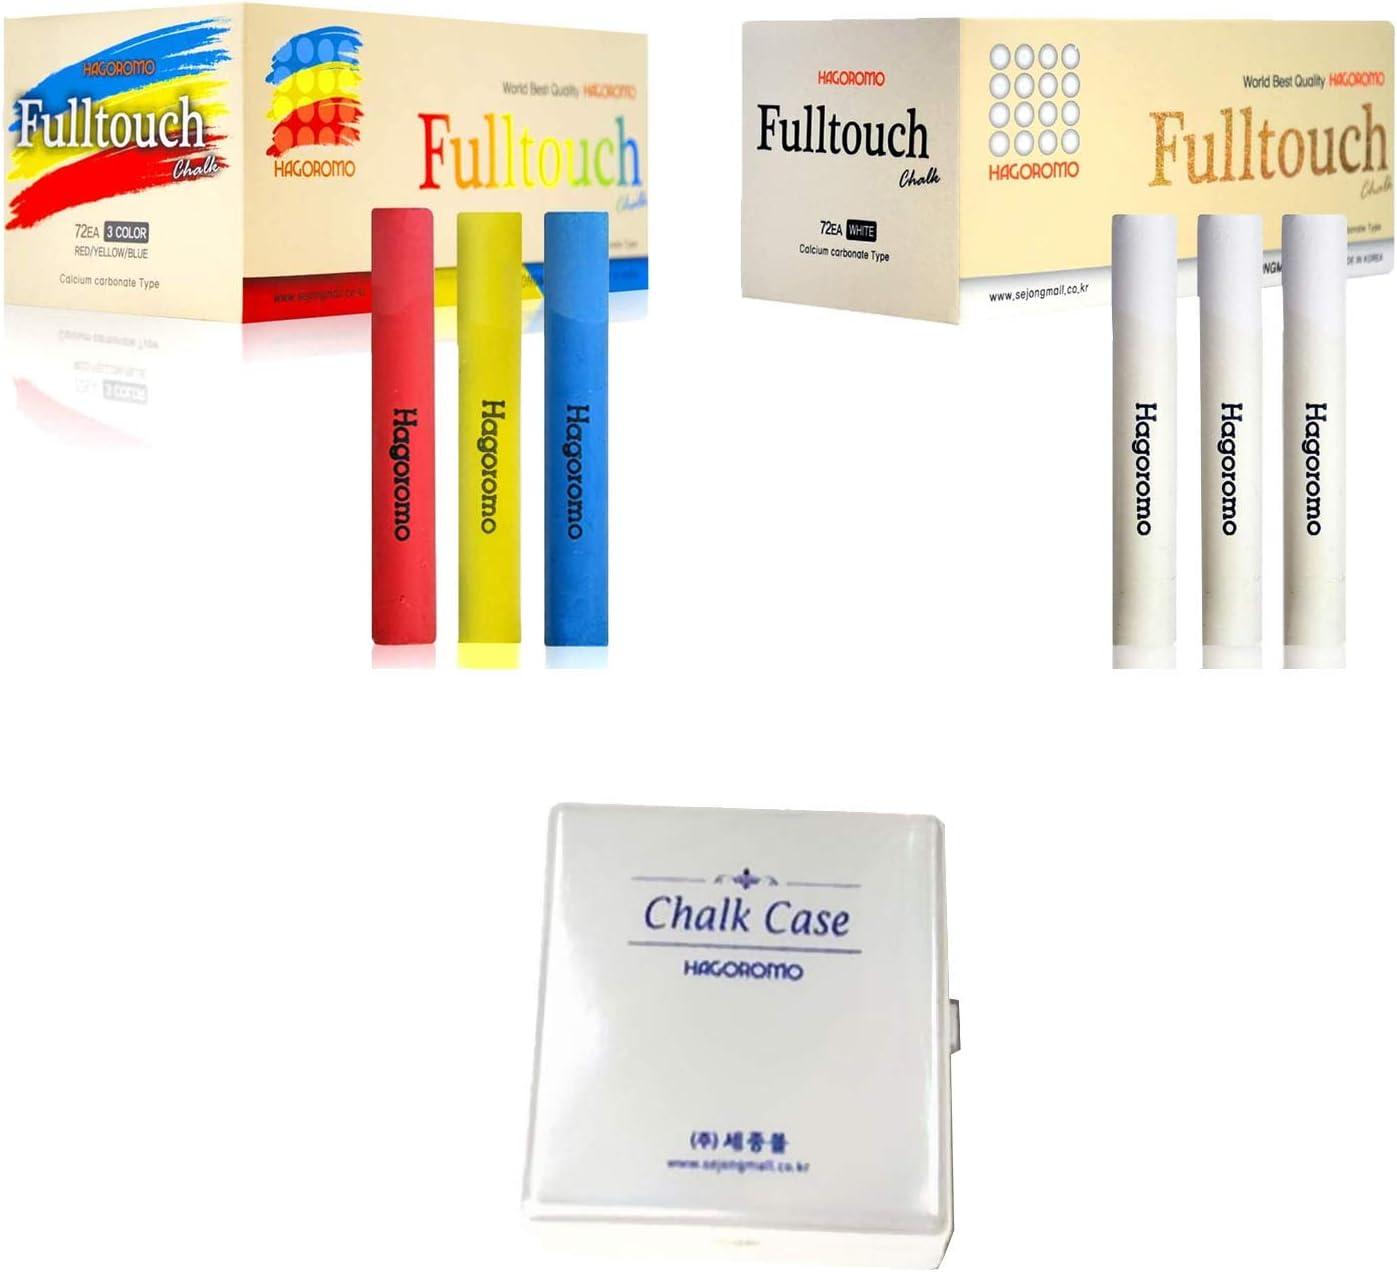 12 Pcs//10 Color Mix + HAGOROMO Fulltouch Color Chalk 1 Box 72 Pcs//White Bundle: HAGOROMO Fulltouch Color Chalk 1 Box